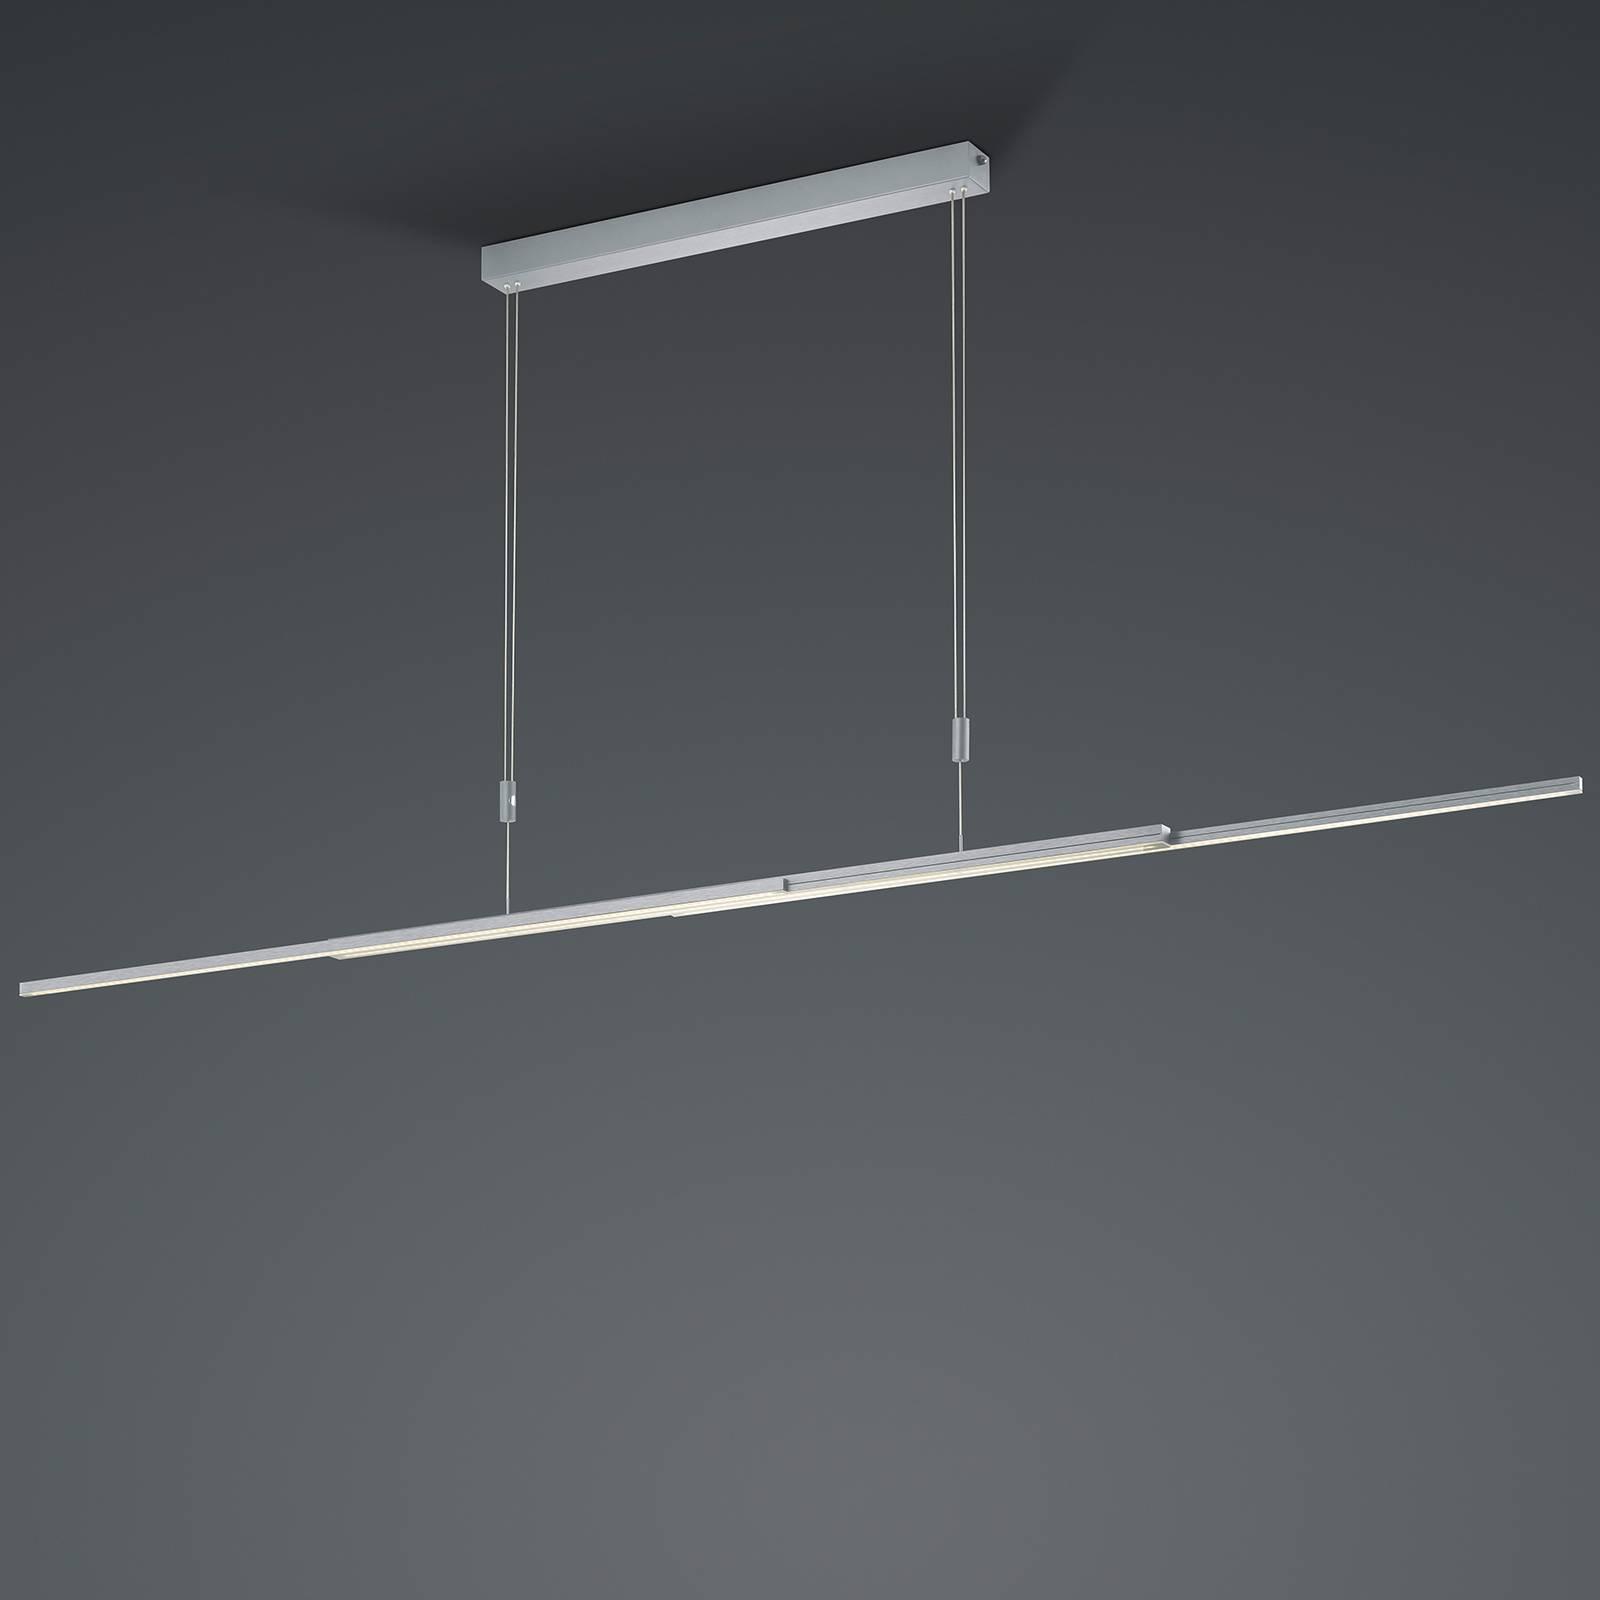 BANKAMP L-lightLINE CCT VerticalDim ZigBee alu